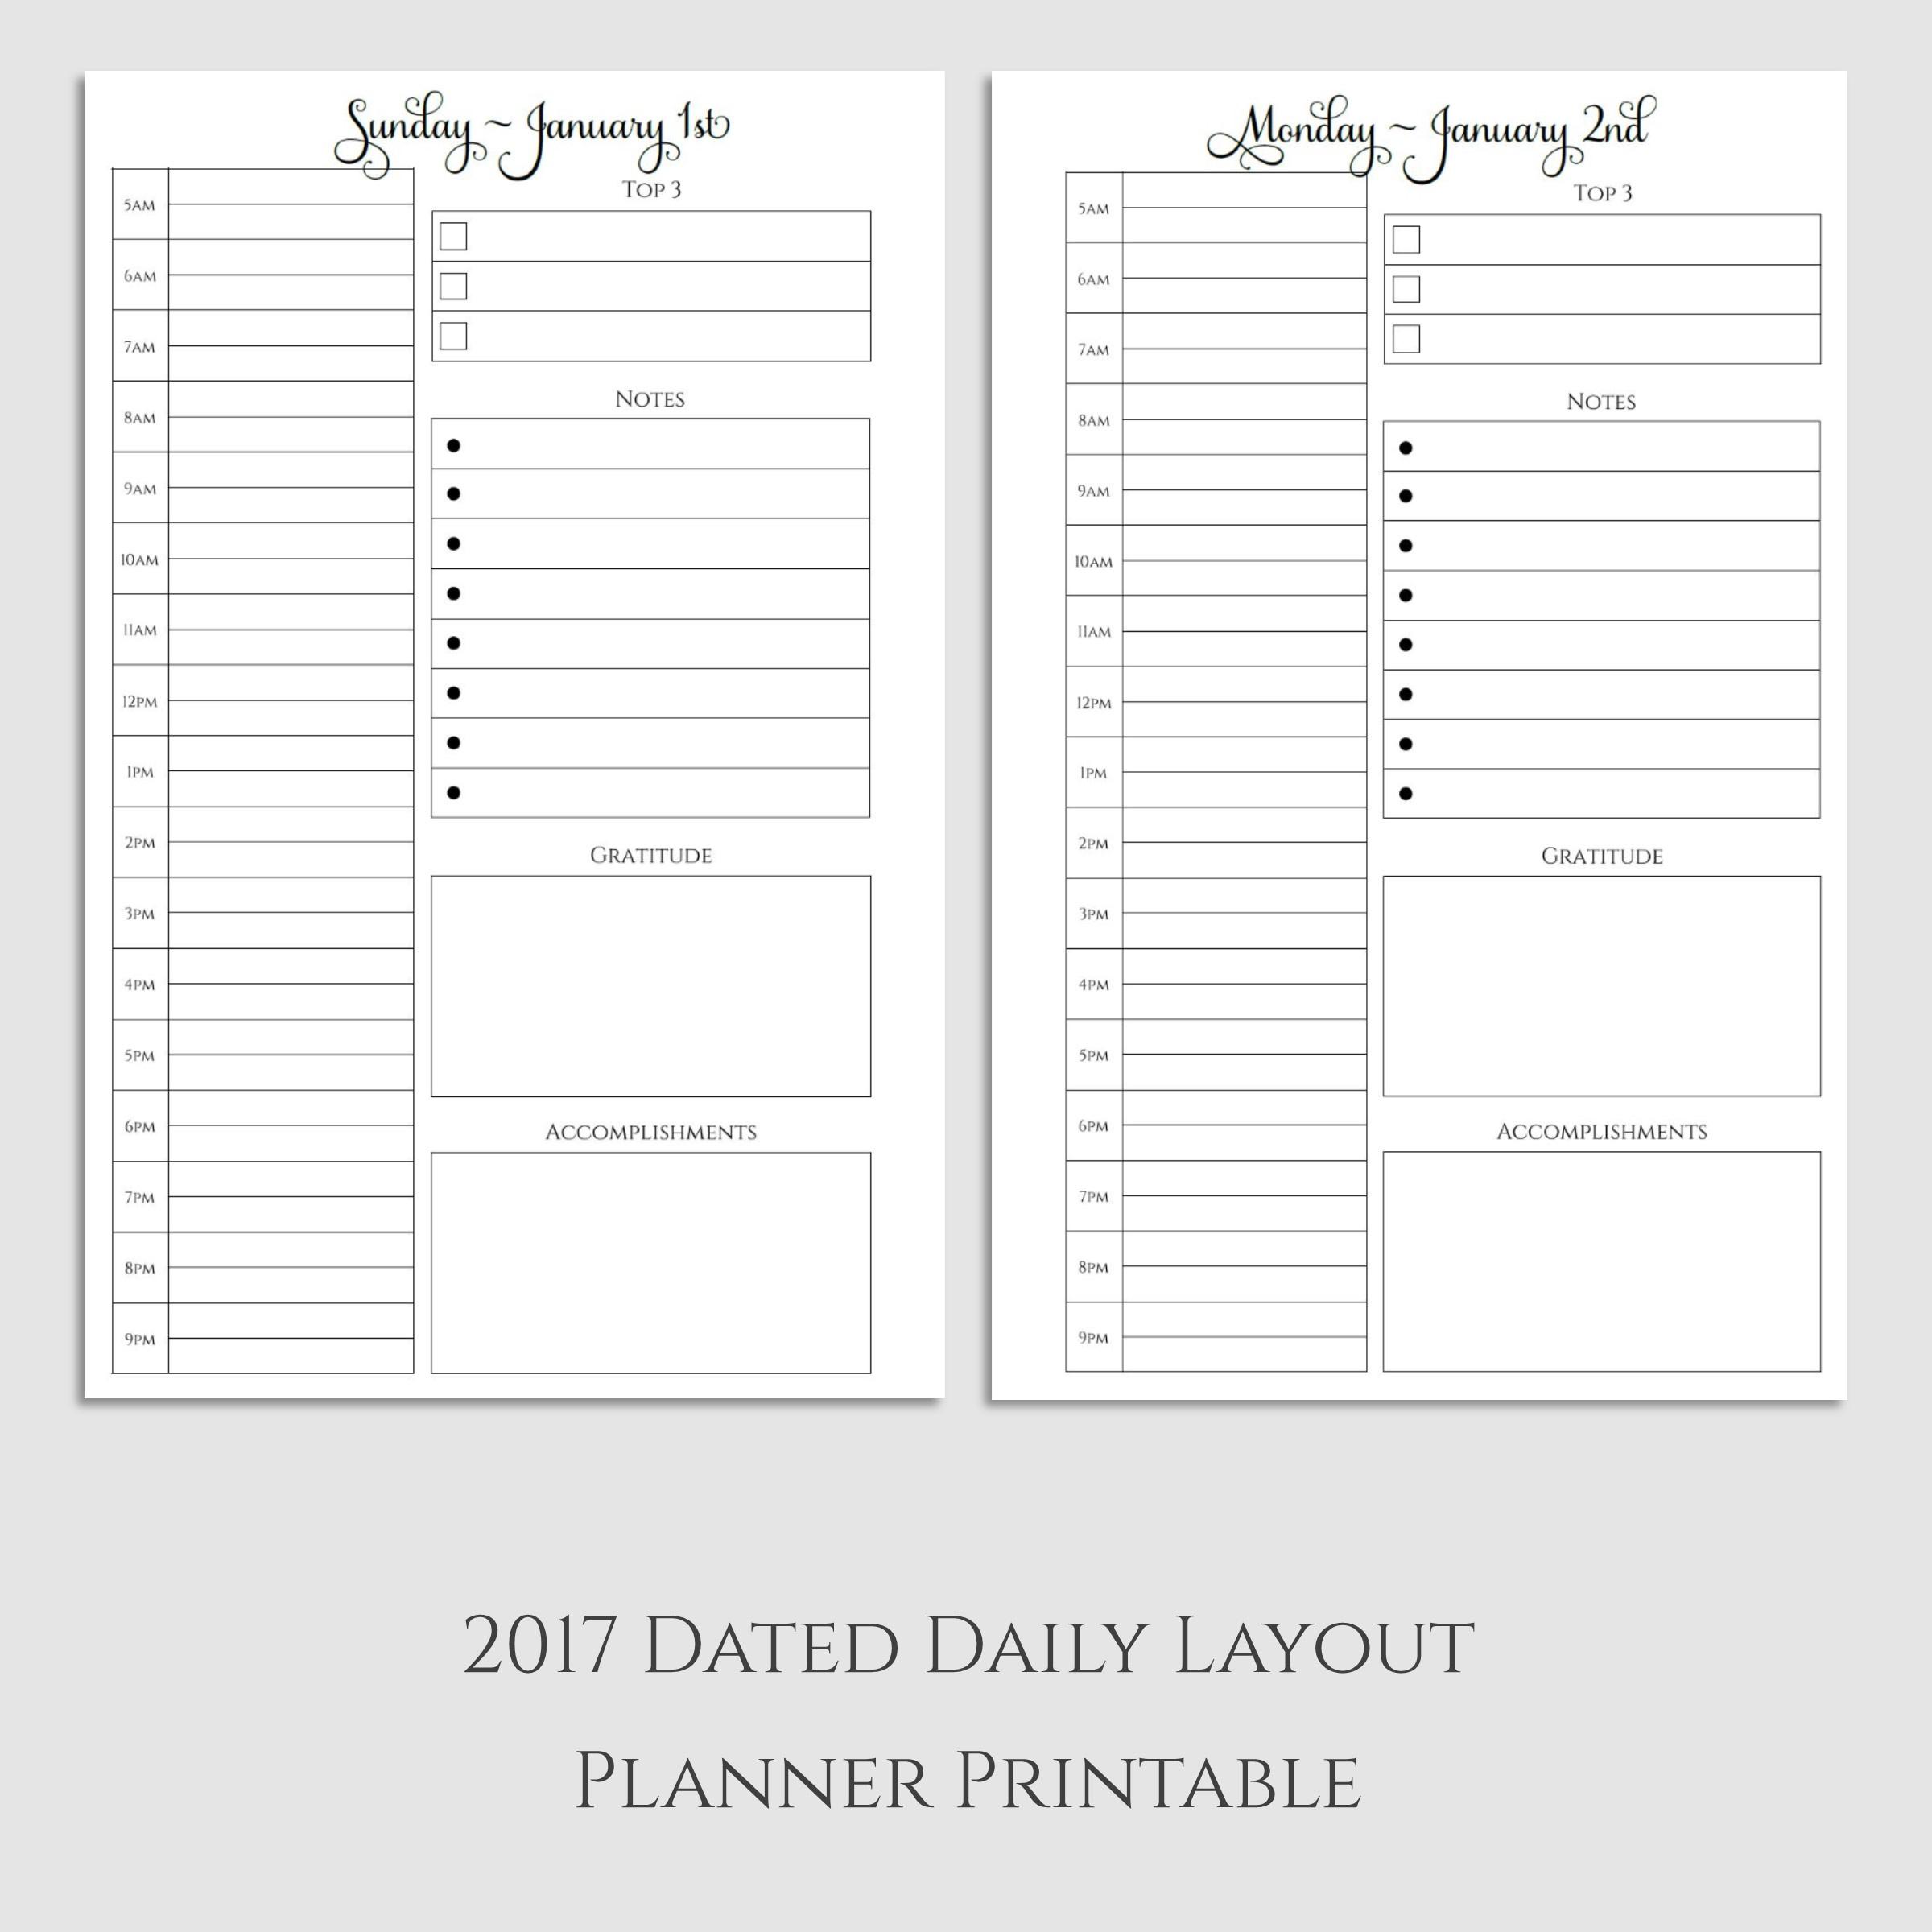 2017 Daily Planner Printable with Gratitude & Accomplishments ...